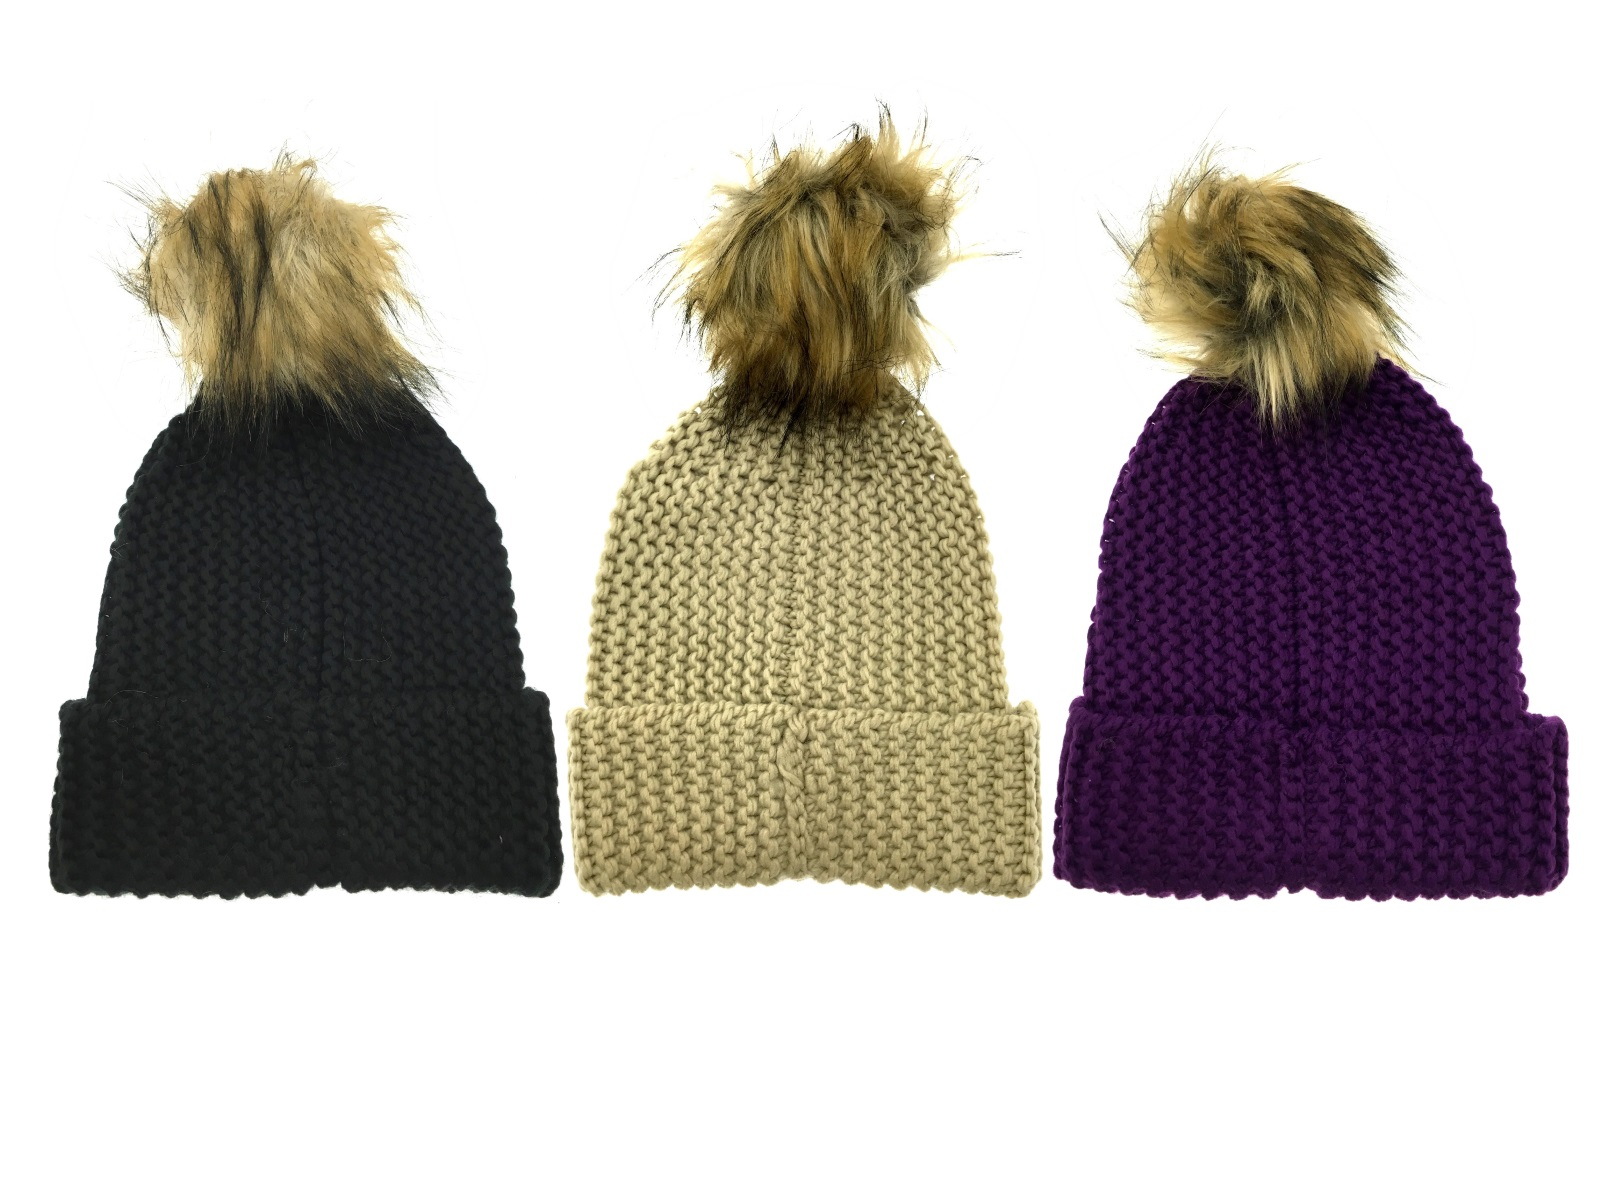 bcb9037b2f3d7 Womens Luxury Chunky Knit Hat Faux Fur Trim Pom Pom Knitted Beanie Bobble  Hat